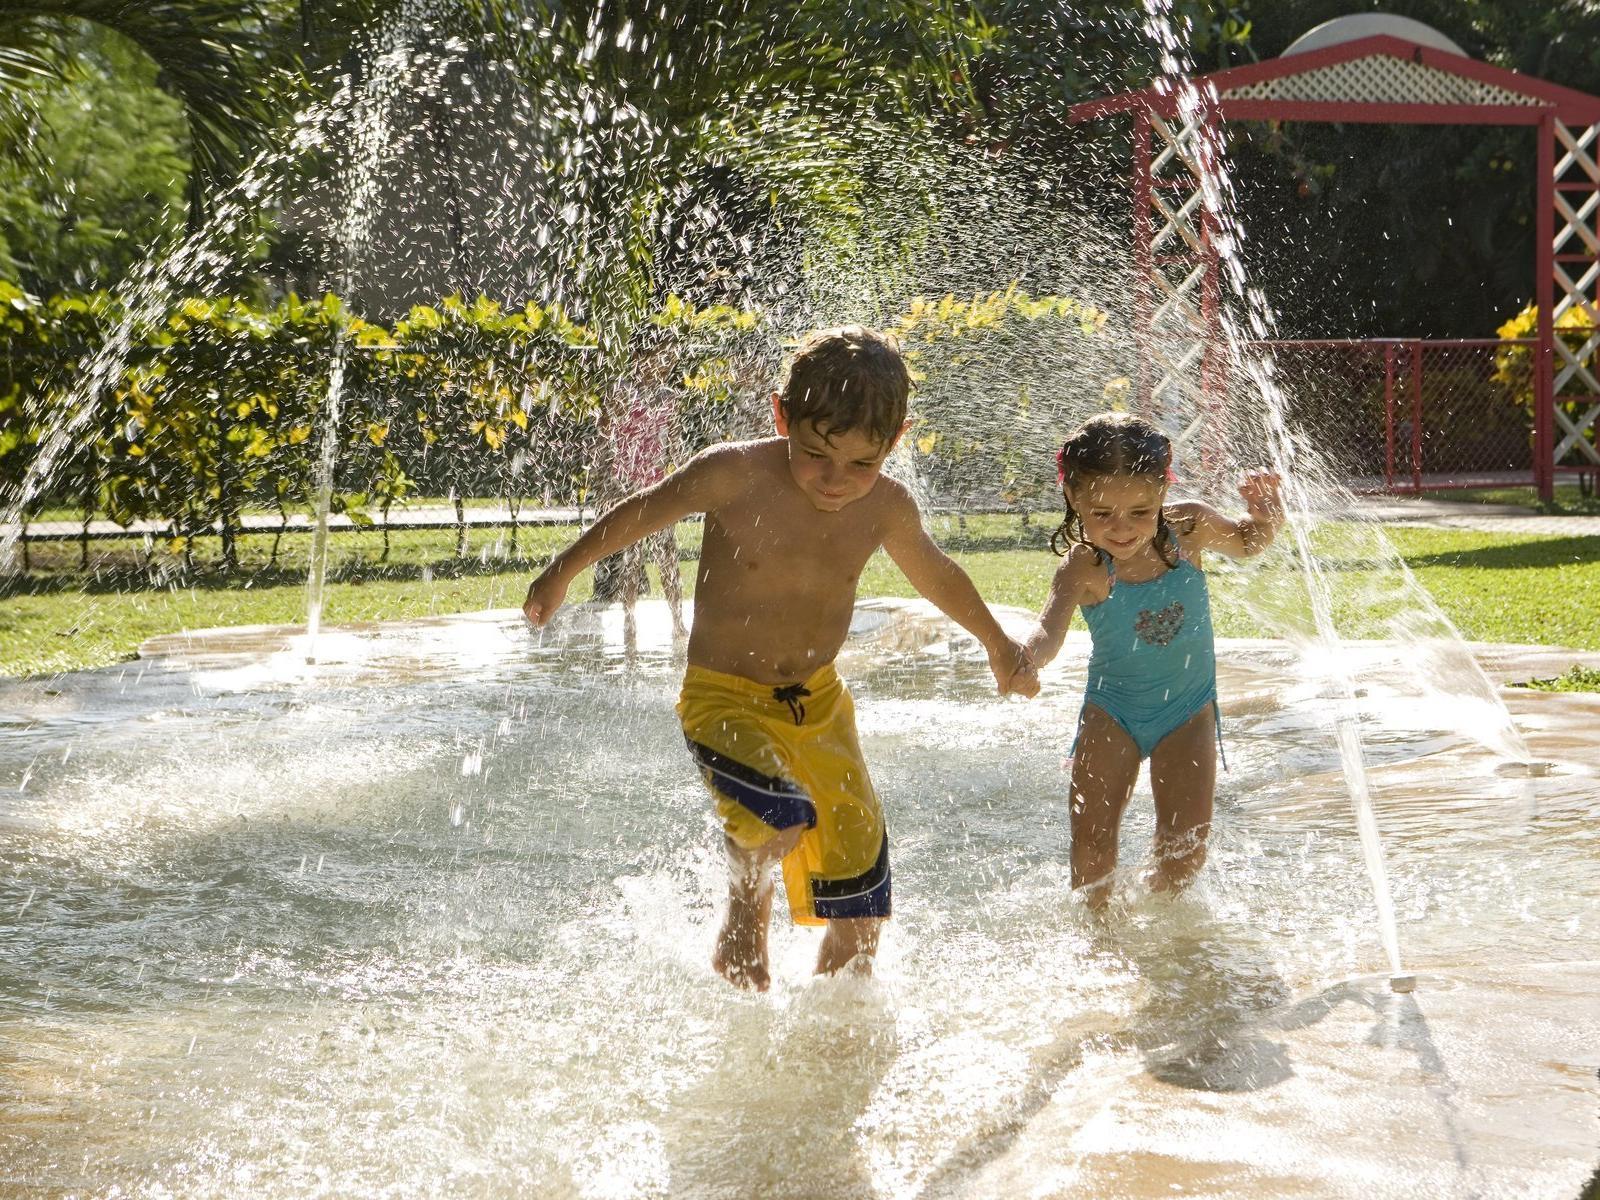 Two children having fun with water at Fiesta Resort